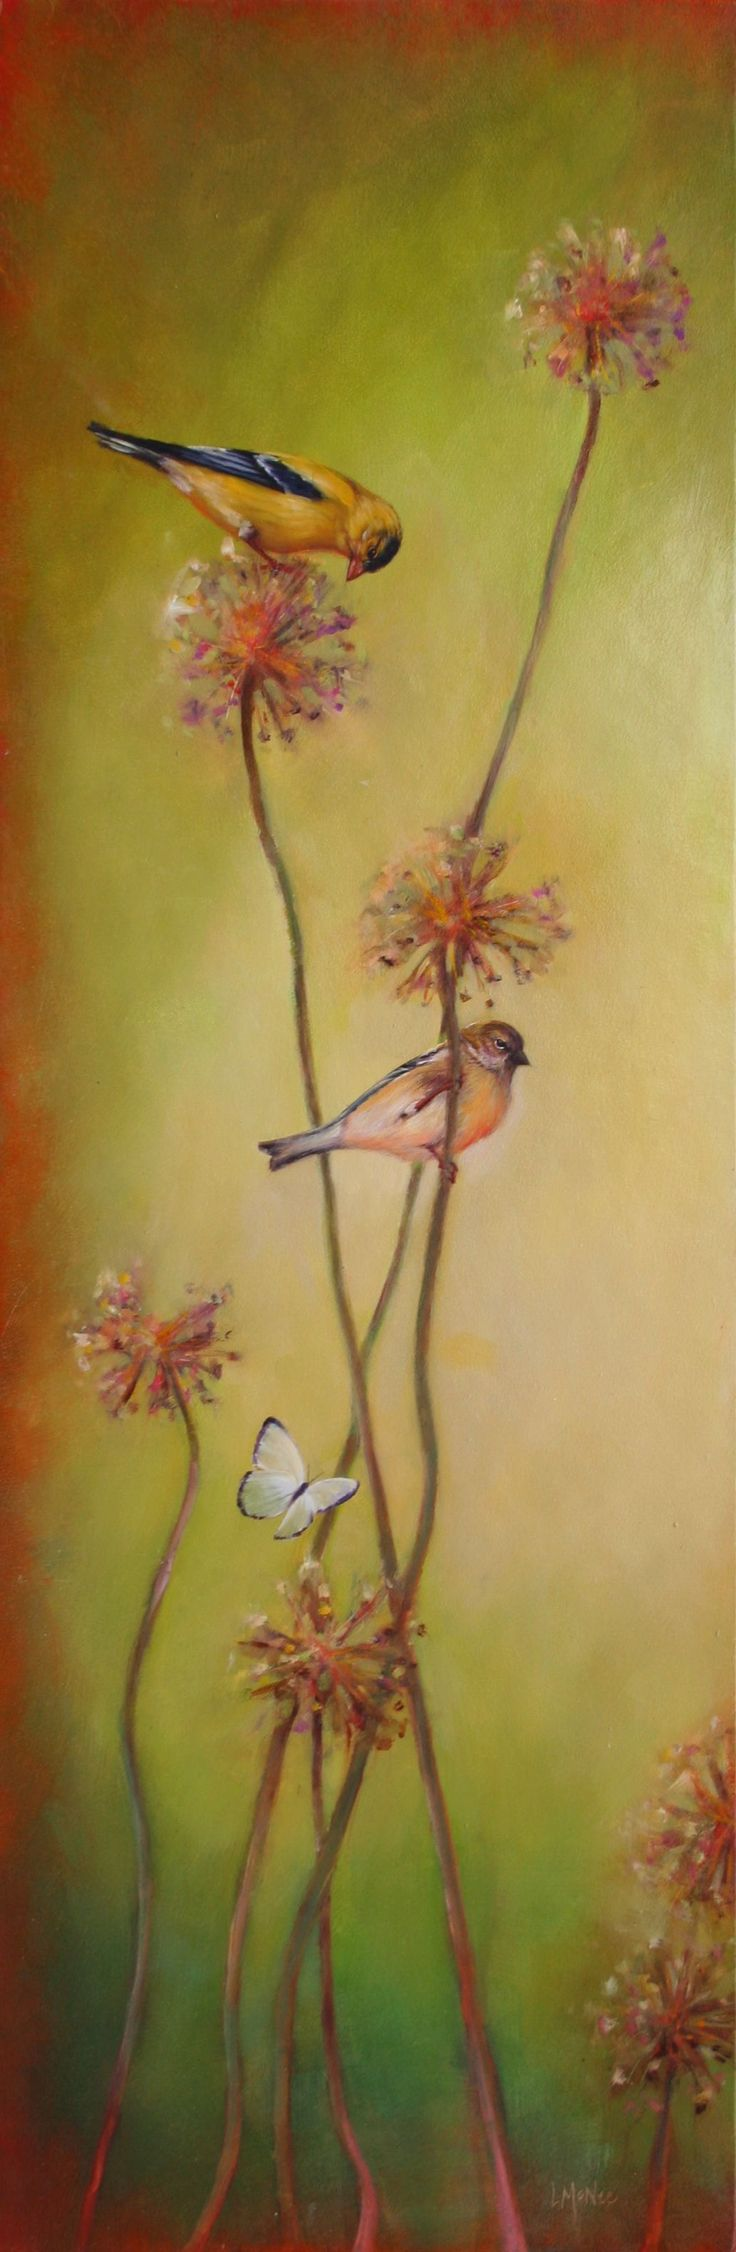 95 best Art ~ Lori McNee images on Pinterest | Backdrops ...